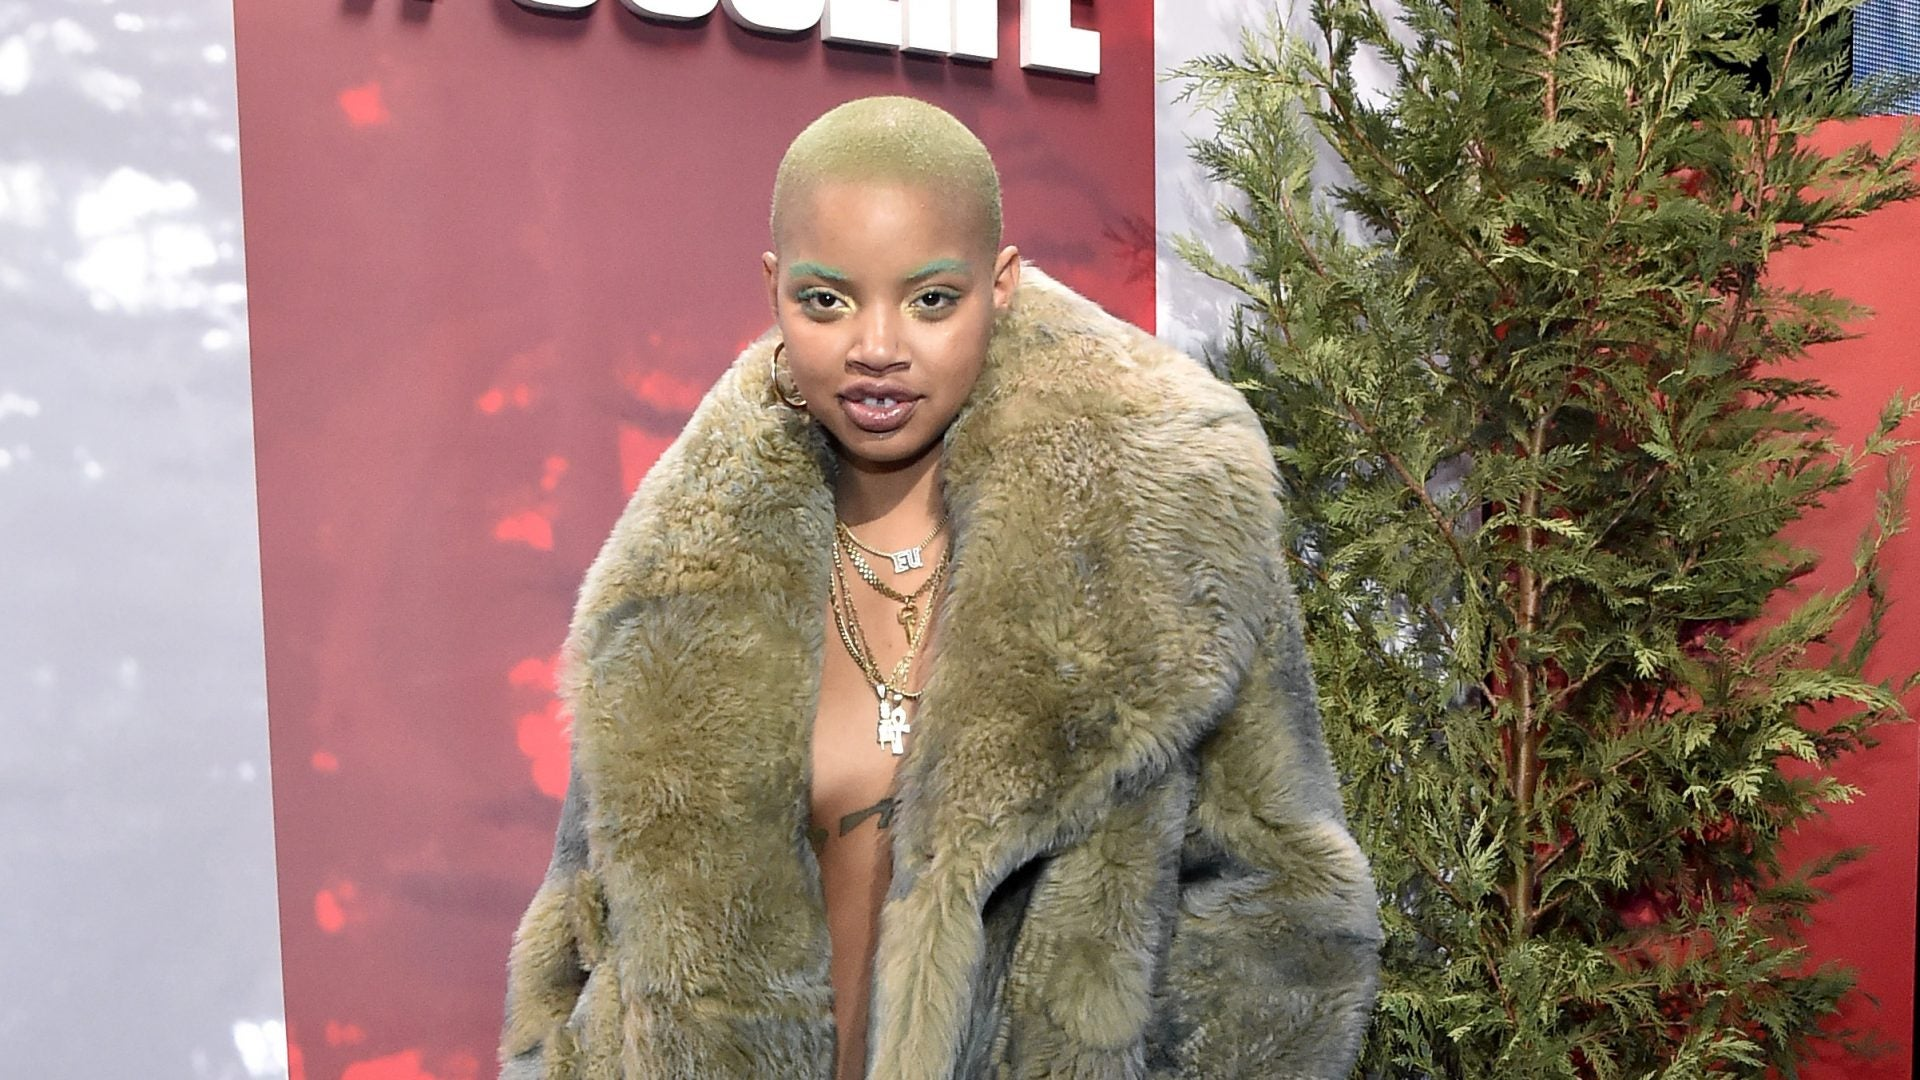 Model-Actress Slick Woods Suffers 'Unexpected Seizure'